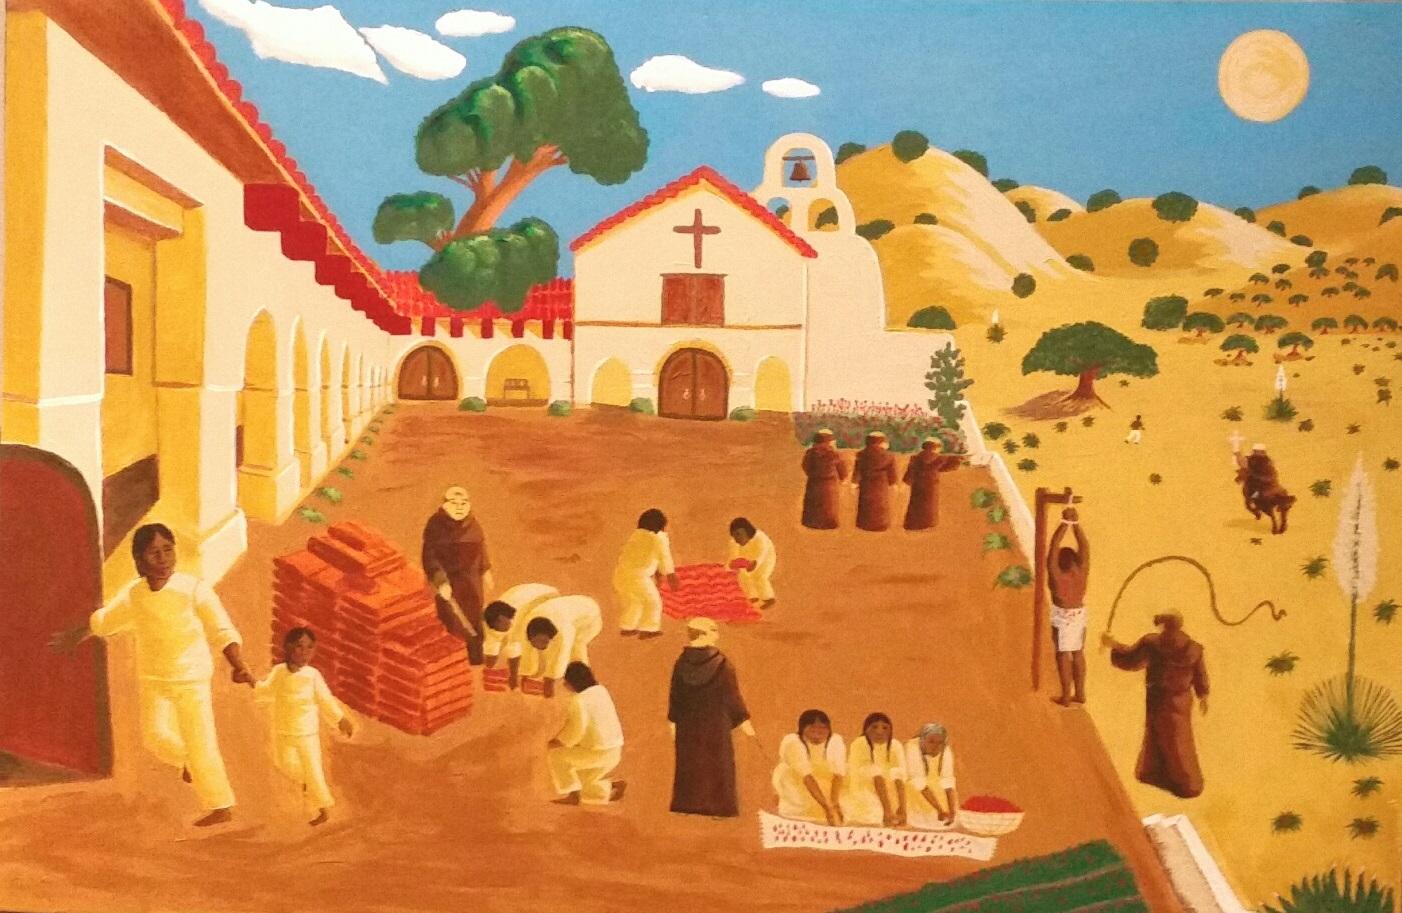 Mission Era by Alicia Maria Siu, Antonio Moreno, Vicente Moreno, Vicente Teoxiutleko